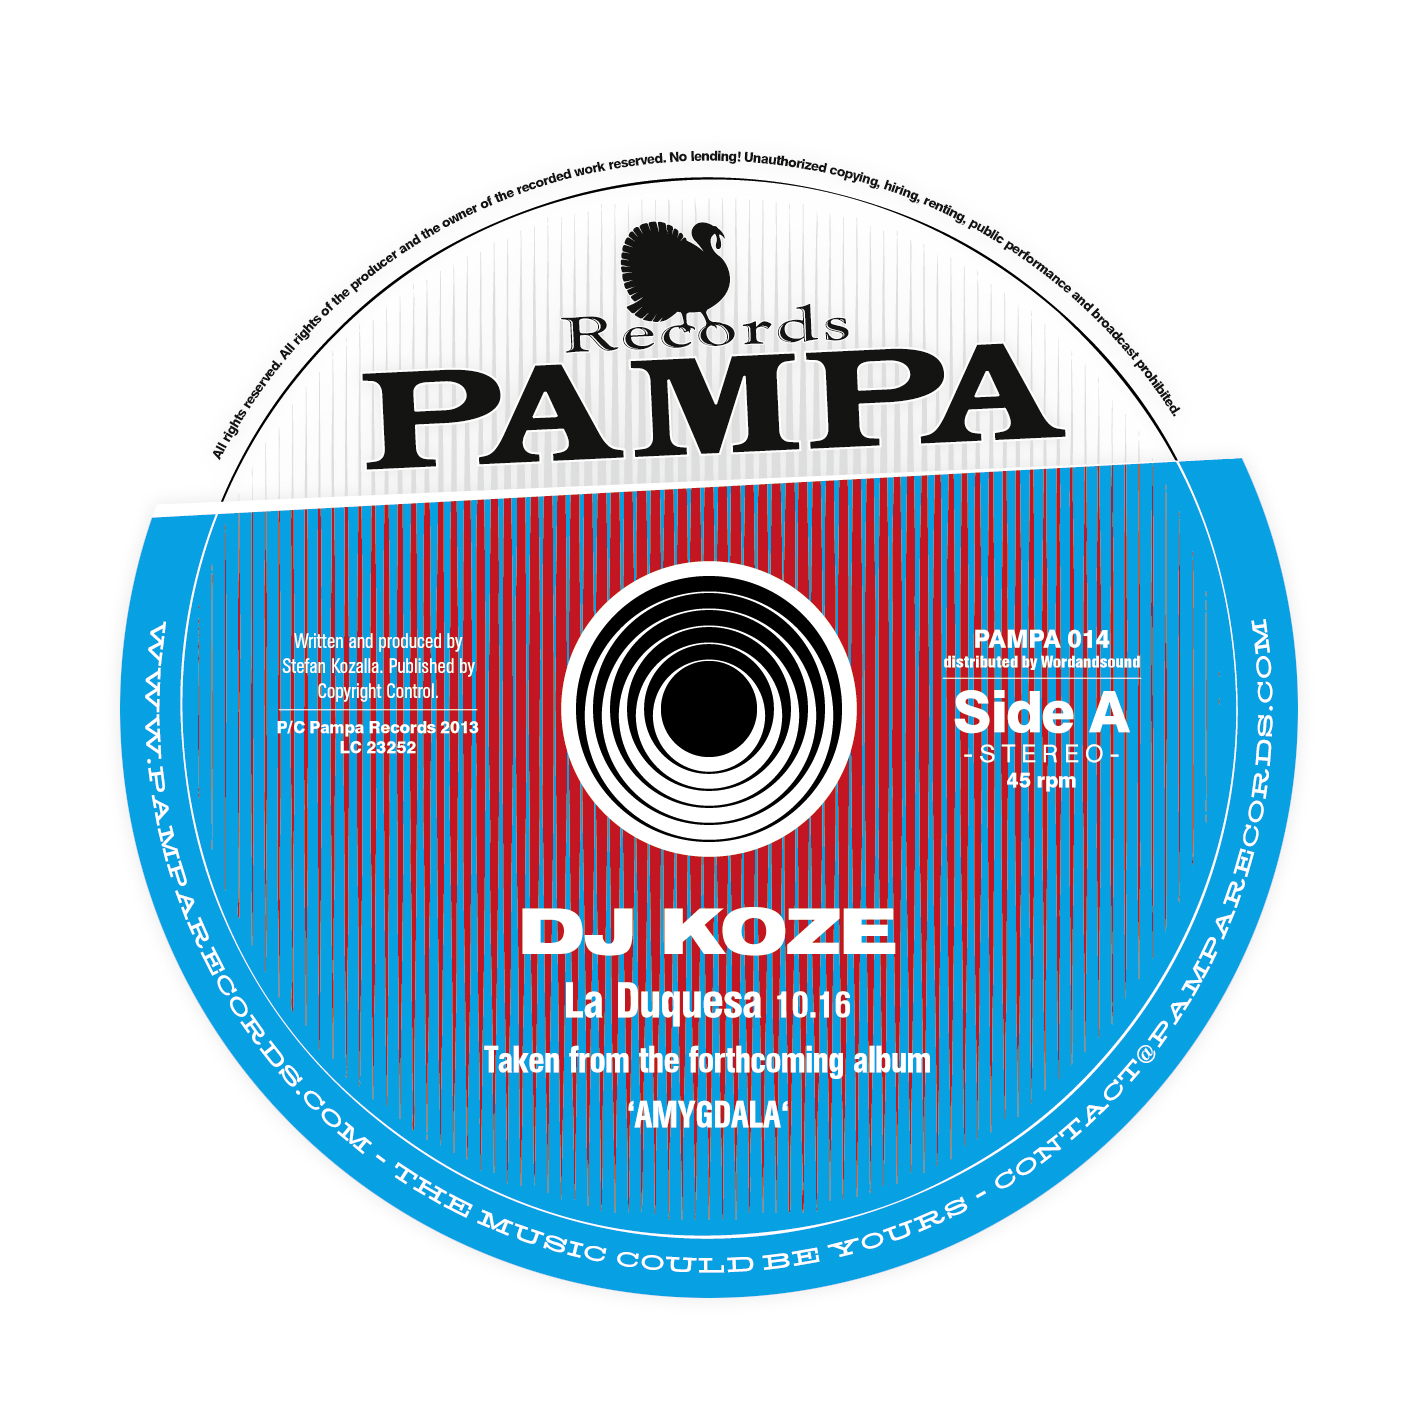 DJ Koze – La Duquesa (Pampa Records)